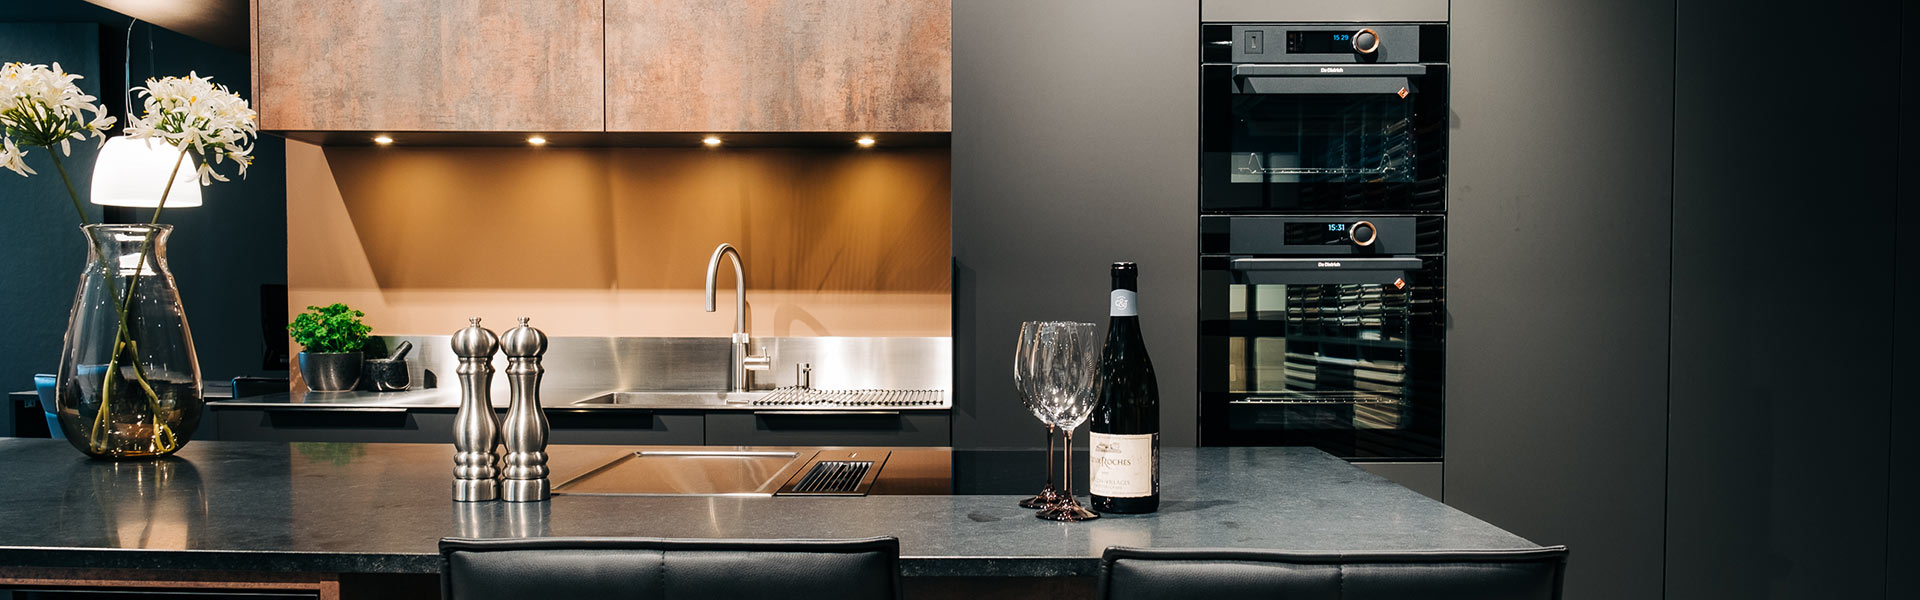 køkkenbordplade i stål